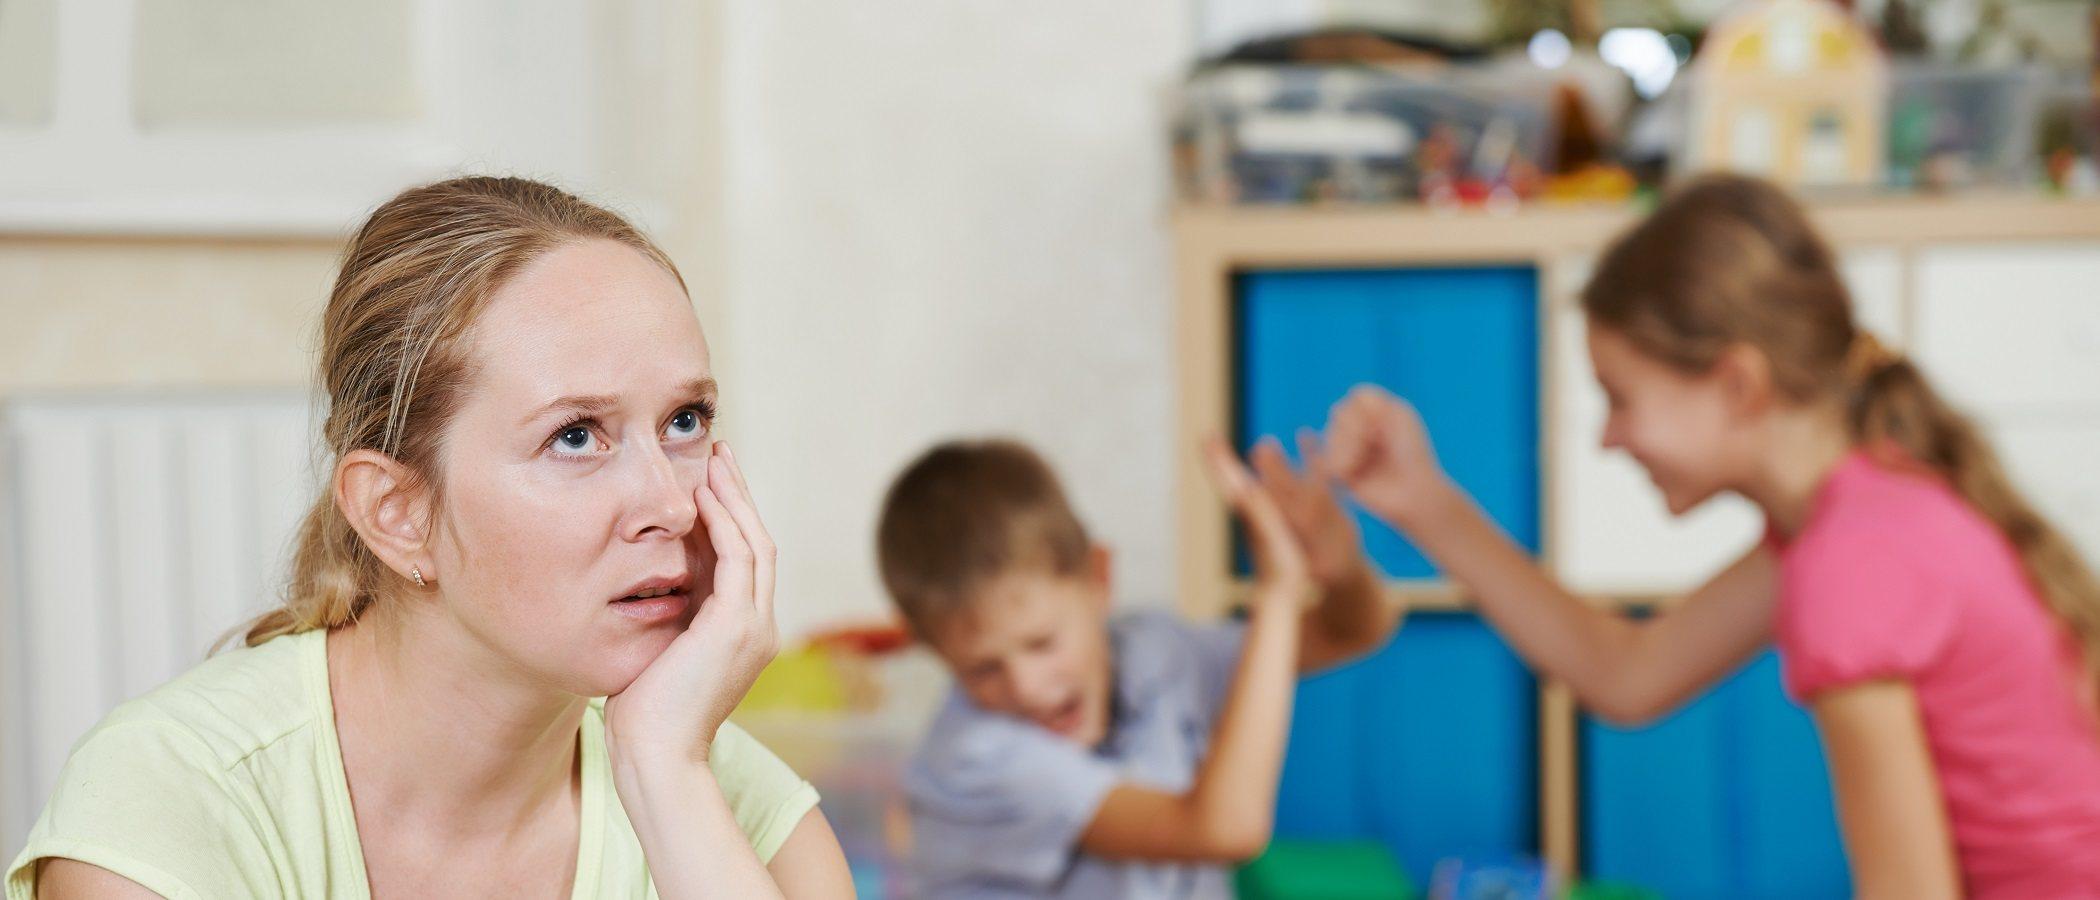 Mala crianza vs padres irresponsables